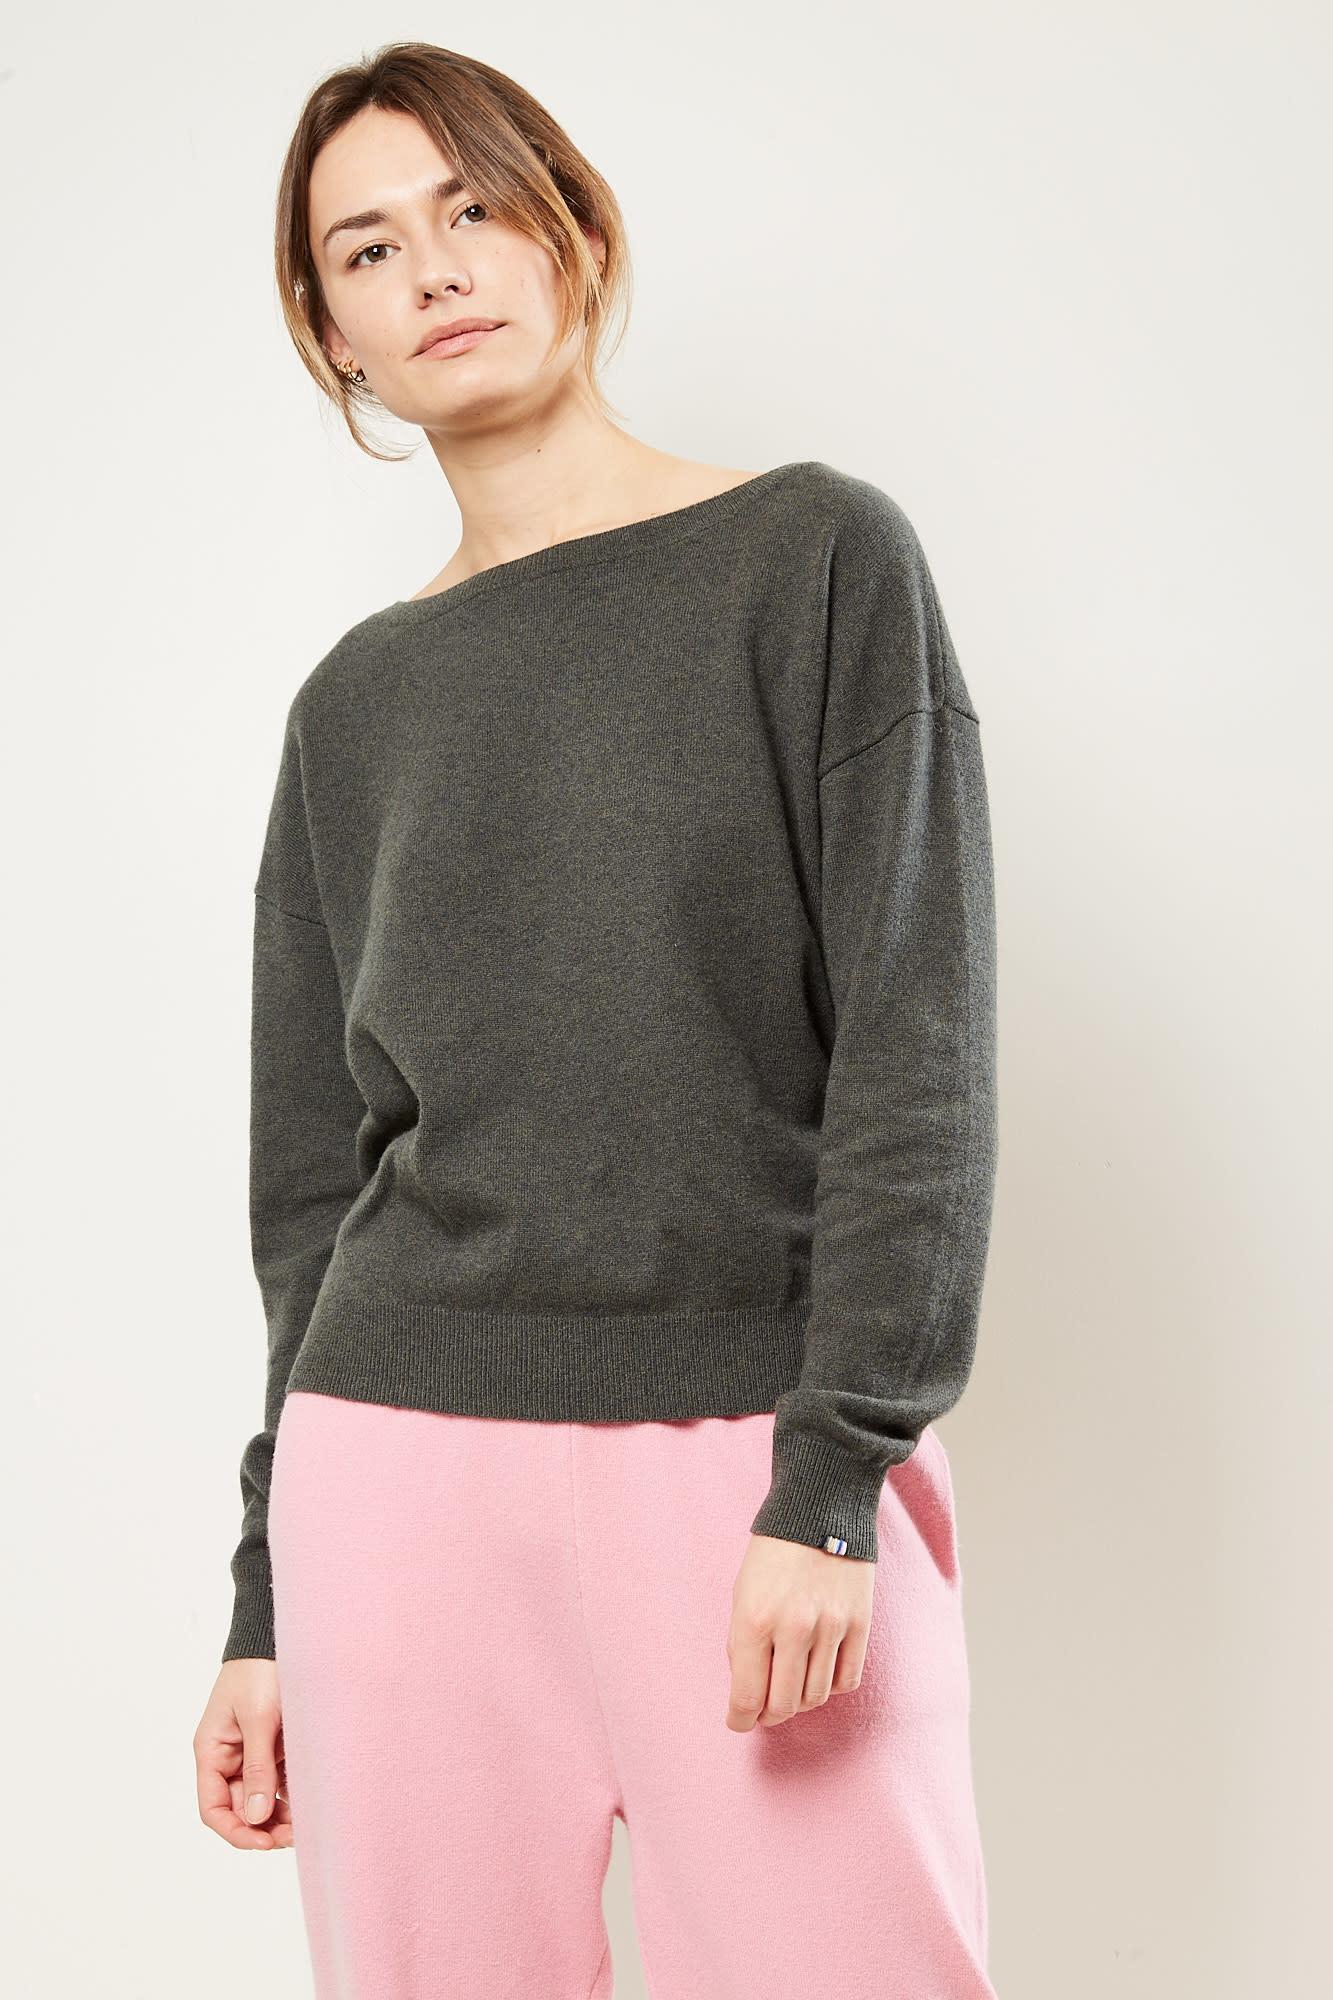 extreme cashmere - No39 Should off shoulder sweater